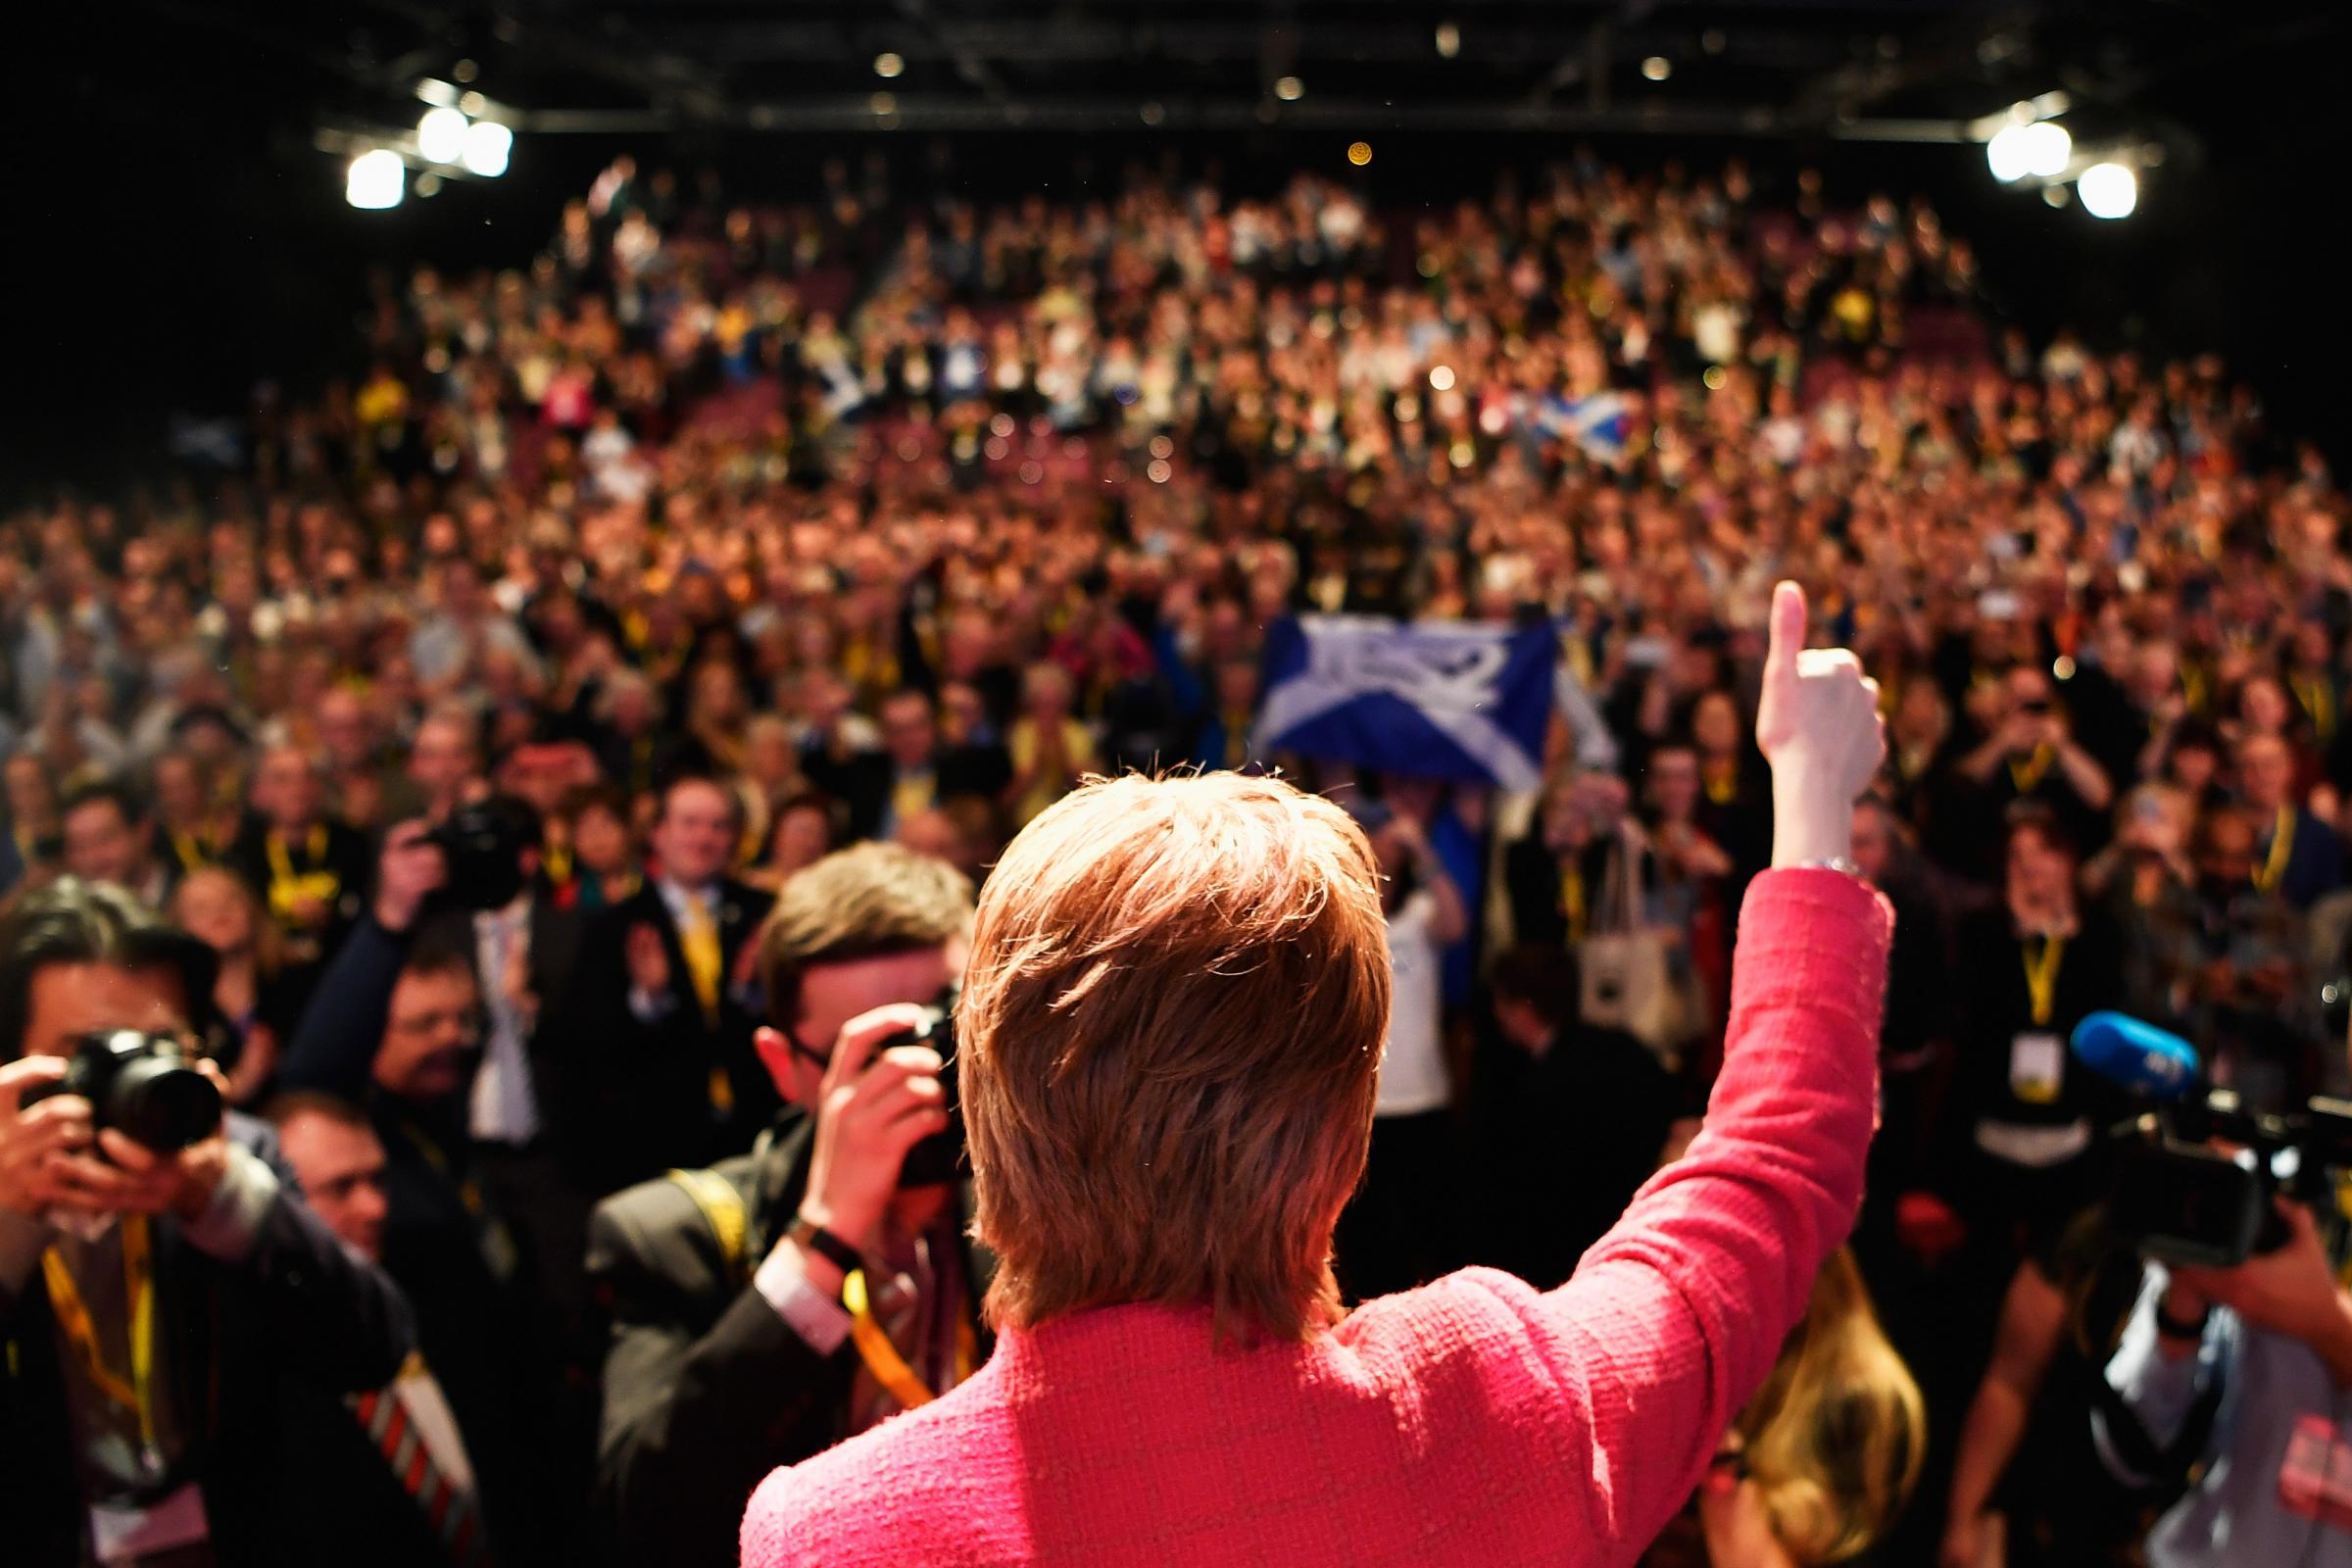 Scottish independence: Nicola Sturgeon to give update on second referendum